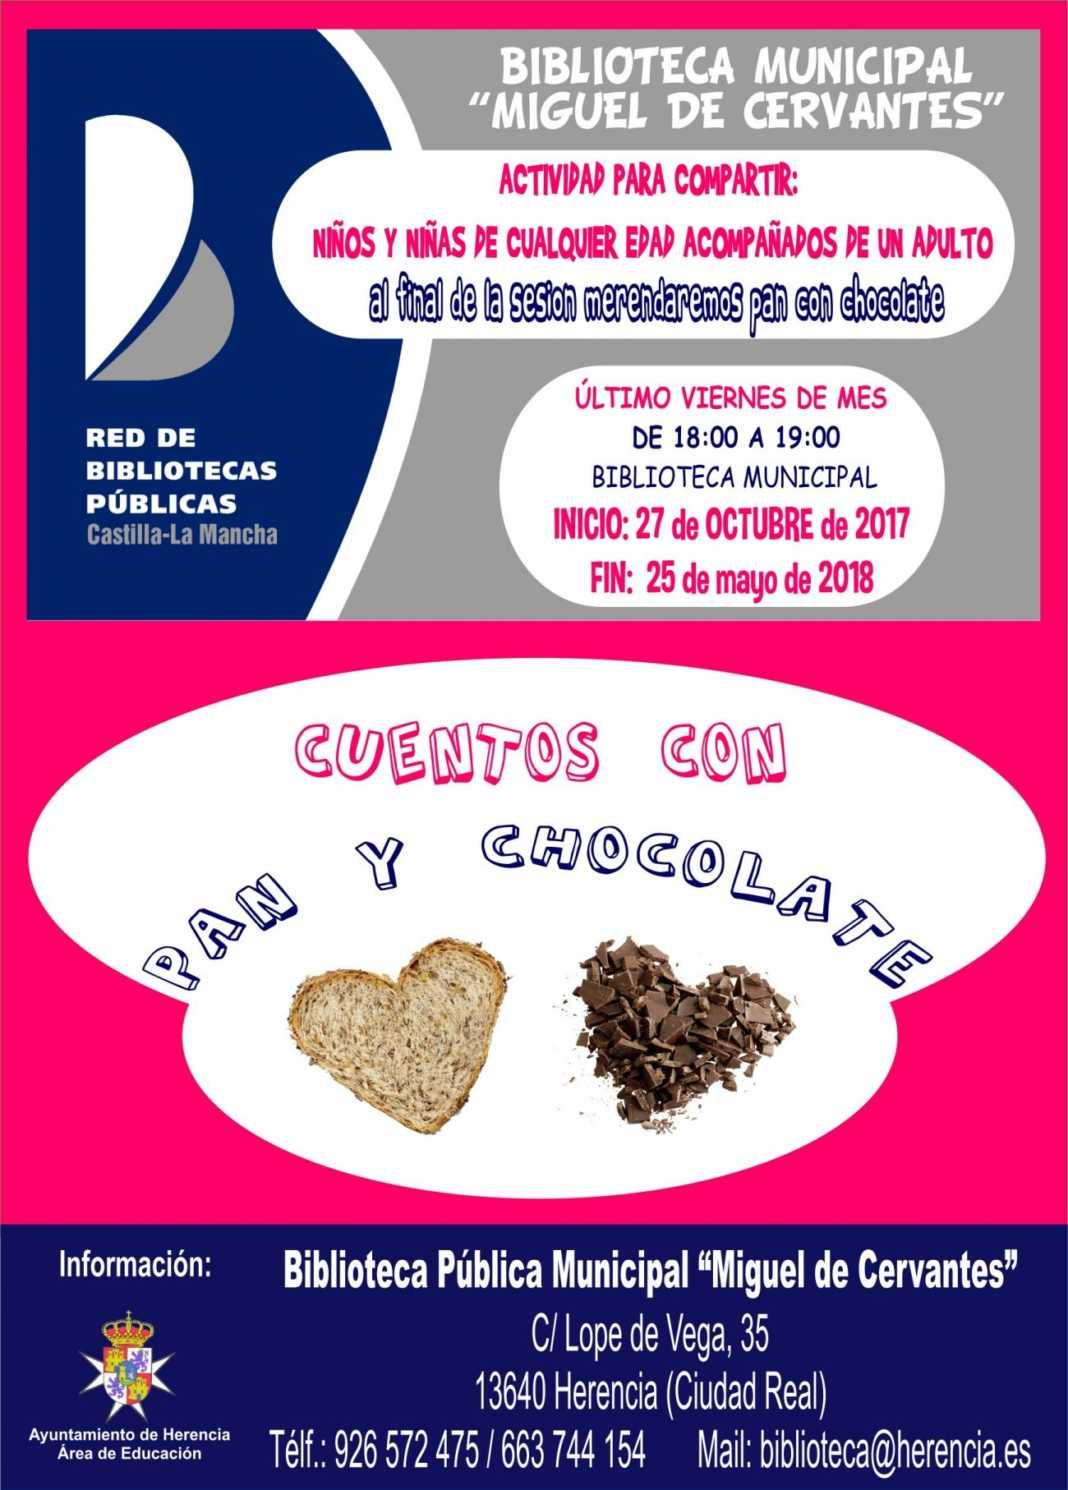 resized Cartel Cuentos con pan y chocolate. 1300x1814 1068x1490 - Nueva temporada de Cuentos con Pan y Chocolate